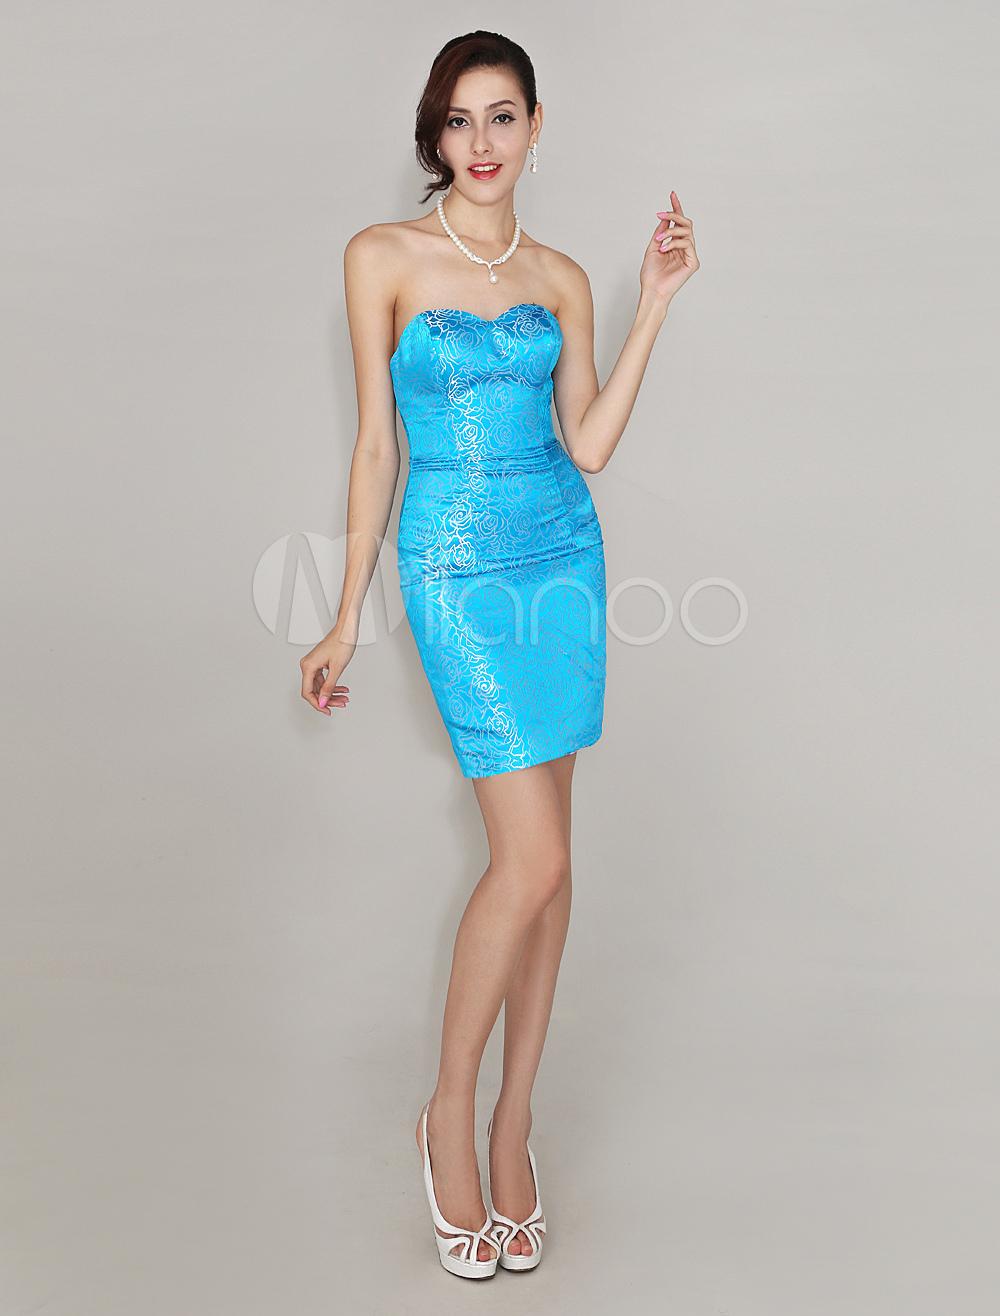 Blue Short Sheath Cocktail Dress with Sweetheart Neck Print Satin (Wedding Cheap Party Dress) photo